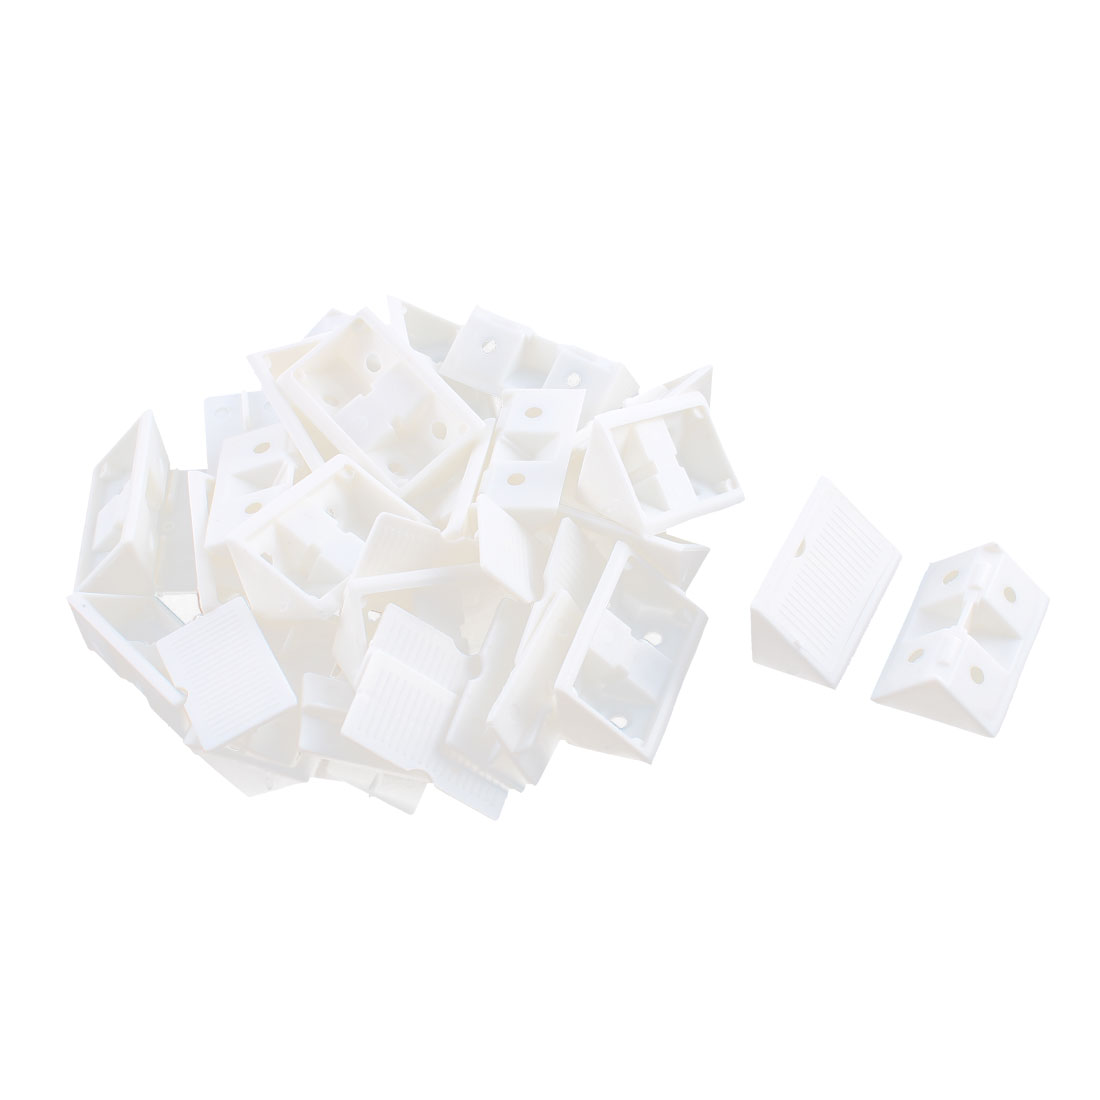 Furniture Cabinet Plastic Corner Bracket Angle Brace 42mm x 20mm x 20mm White 20 Set